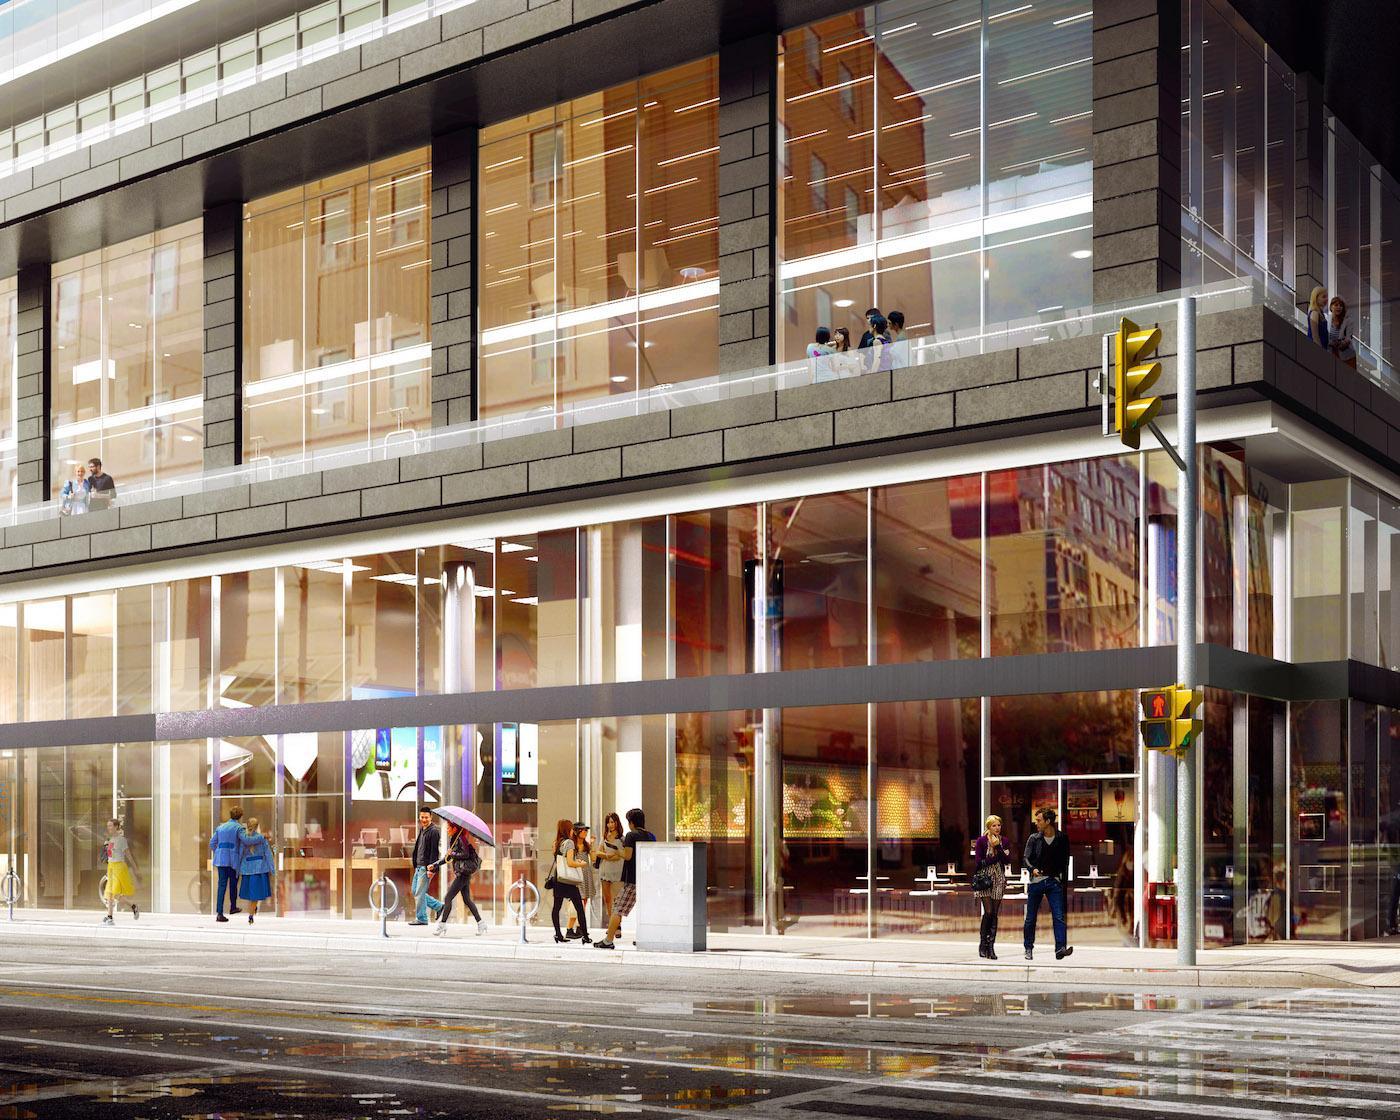 Grid Condos Street View Toronto, Canada